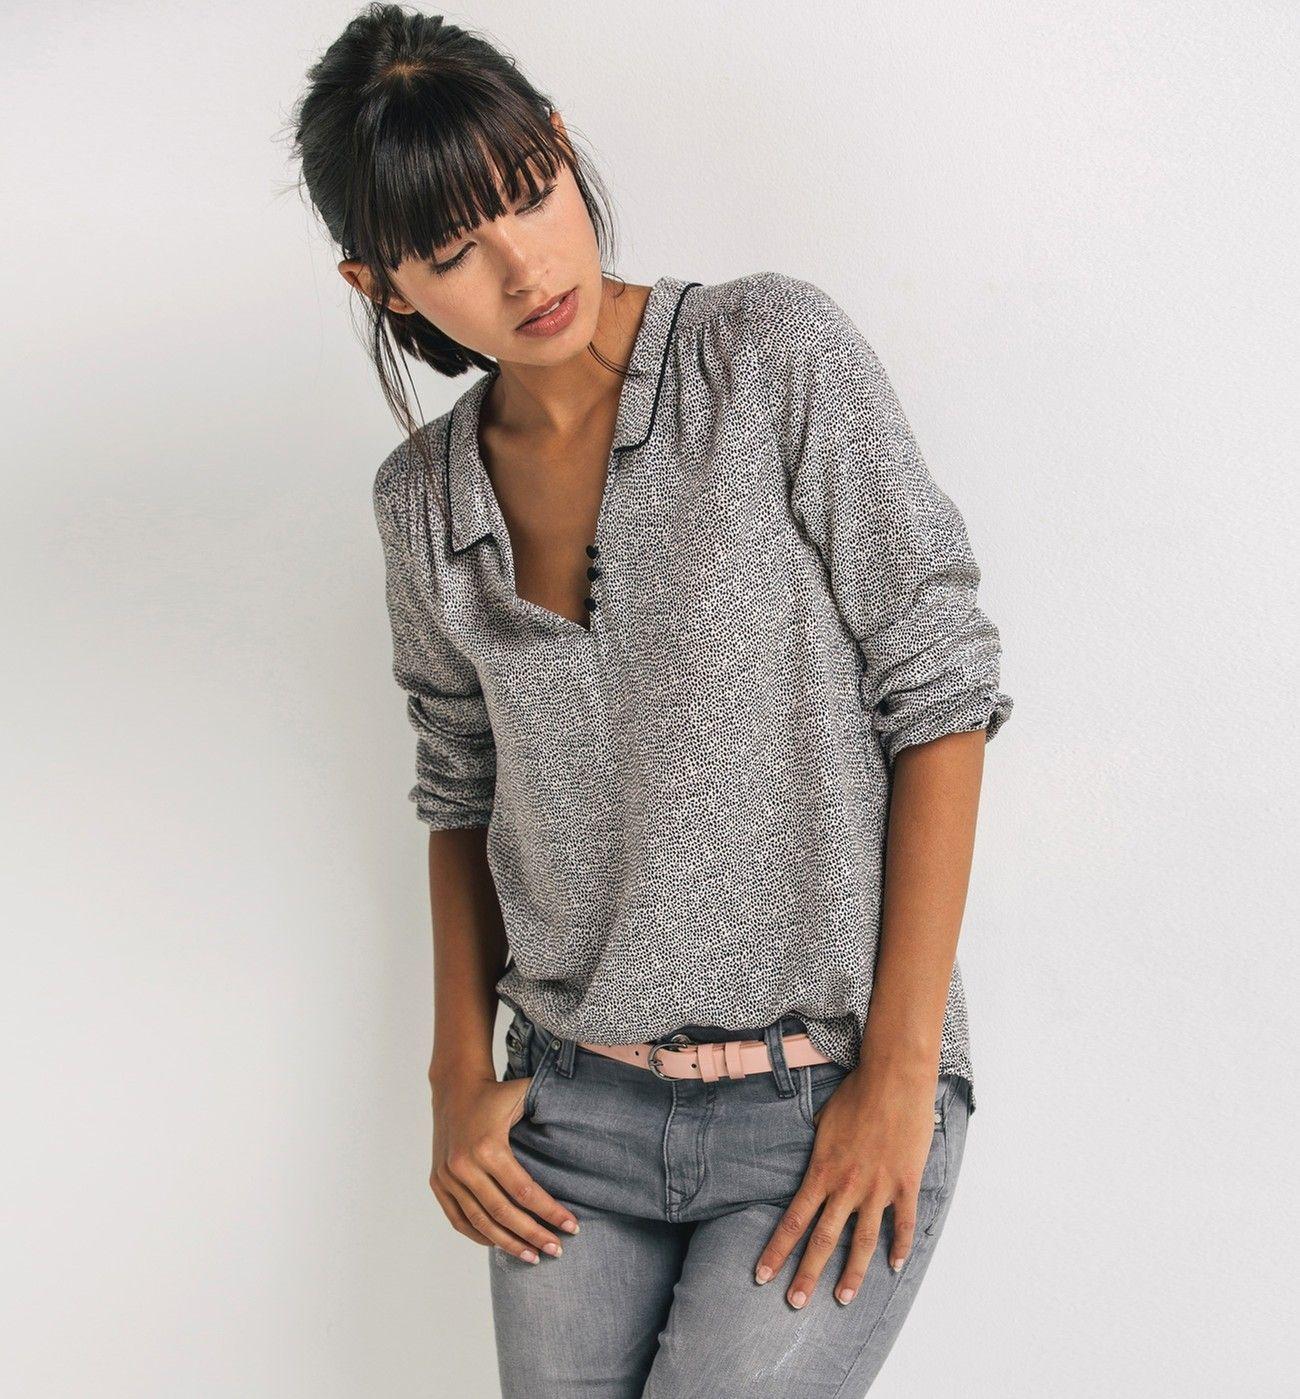 blouse imprim e femme imprim multicolore chemisiers. Black Bedroom Furniture Sets. Home Design Ideas